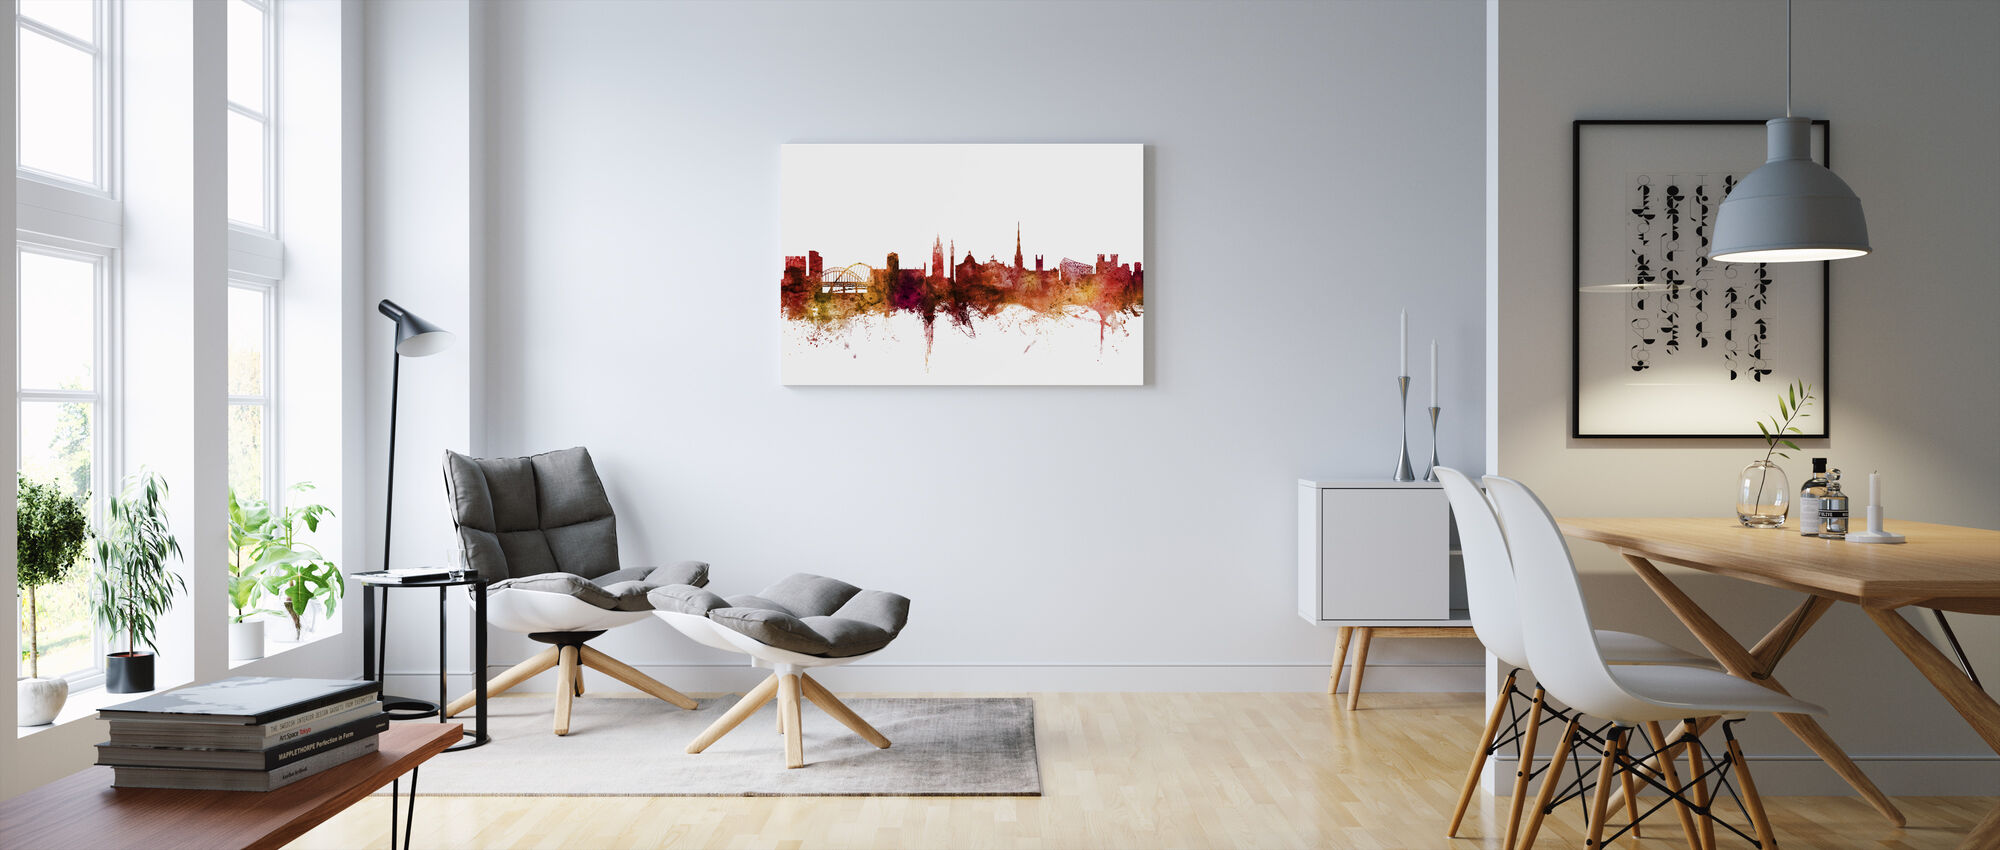 Newcastle England Skyline - Canvas print - Living Room